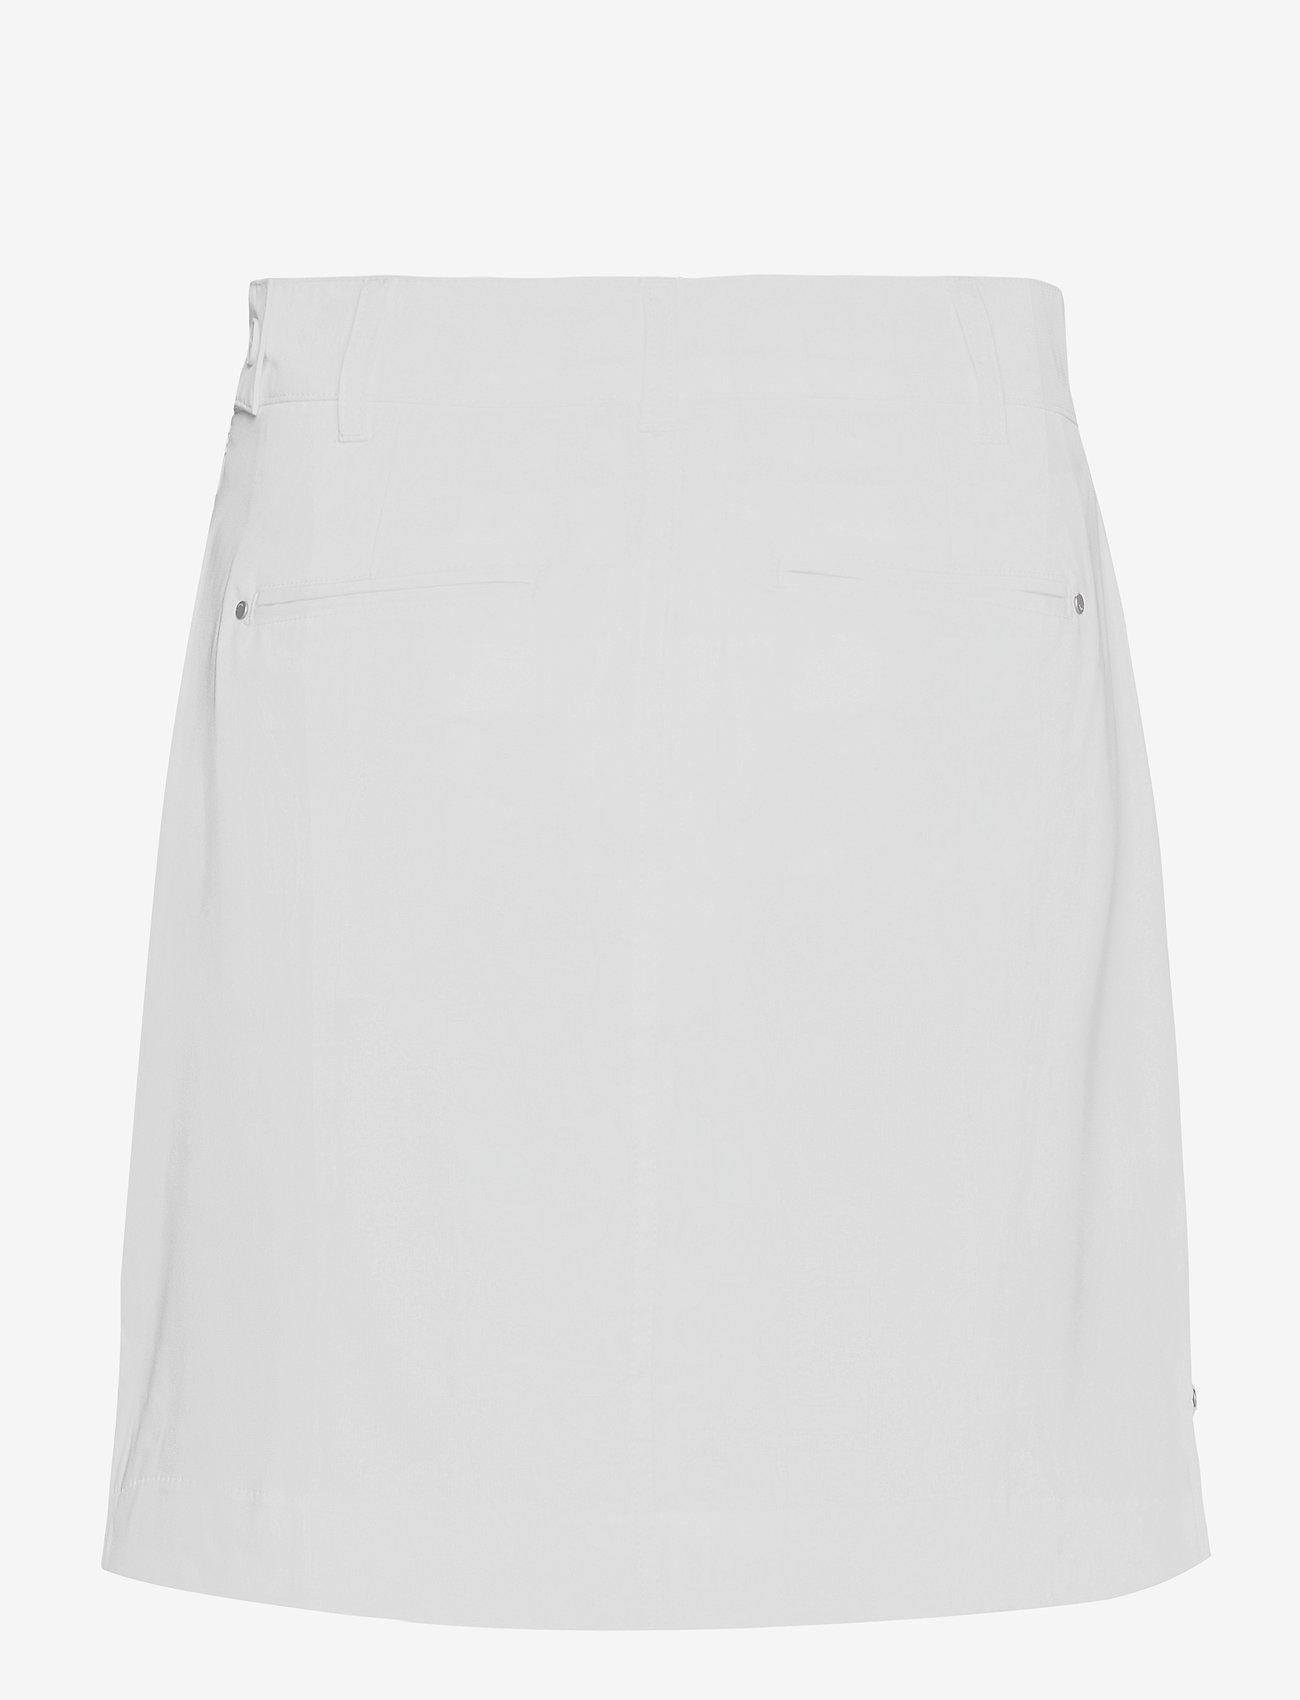 Abacus - Lds Cleek skort 50cm - rokjes - white - 1